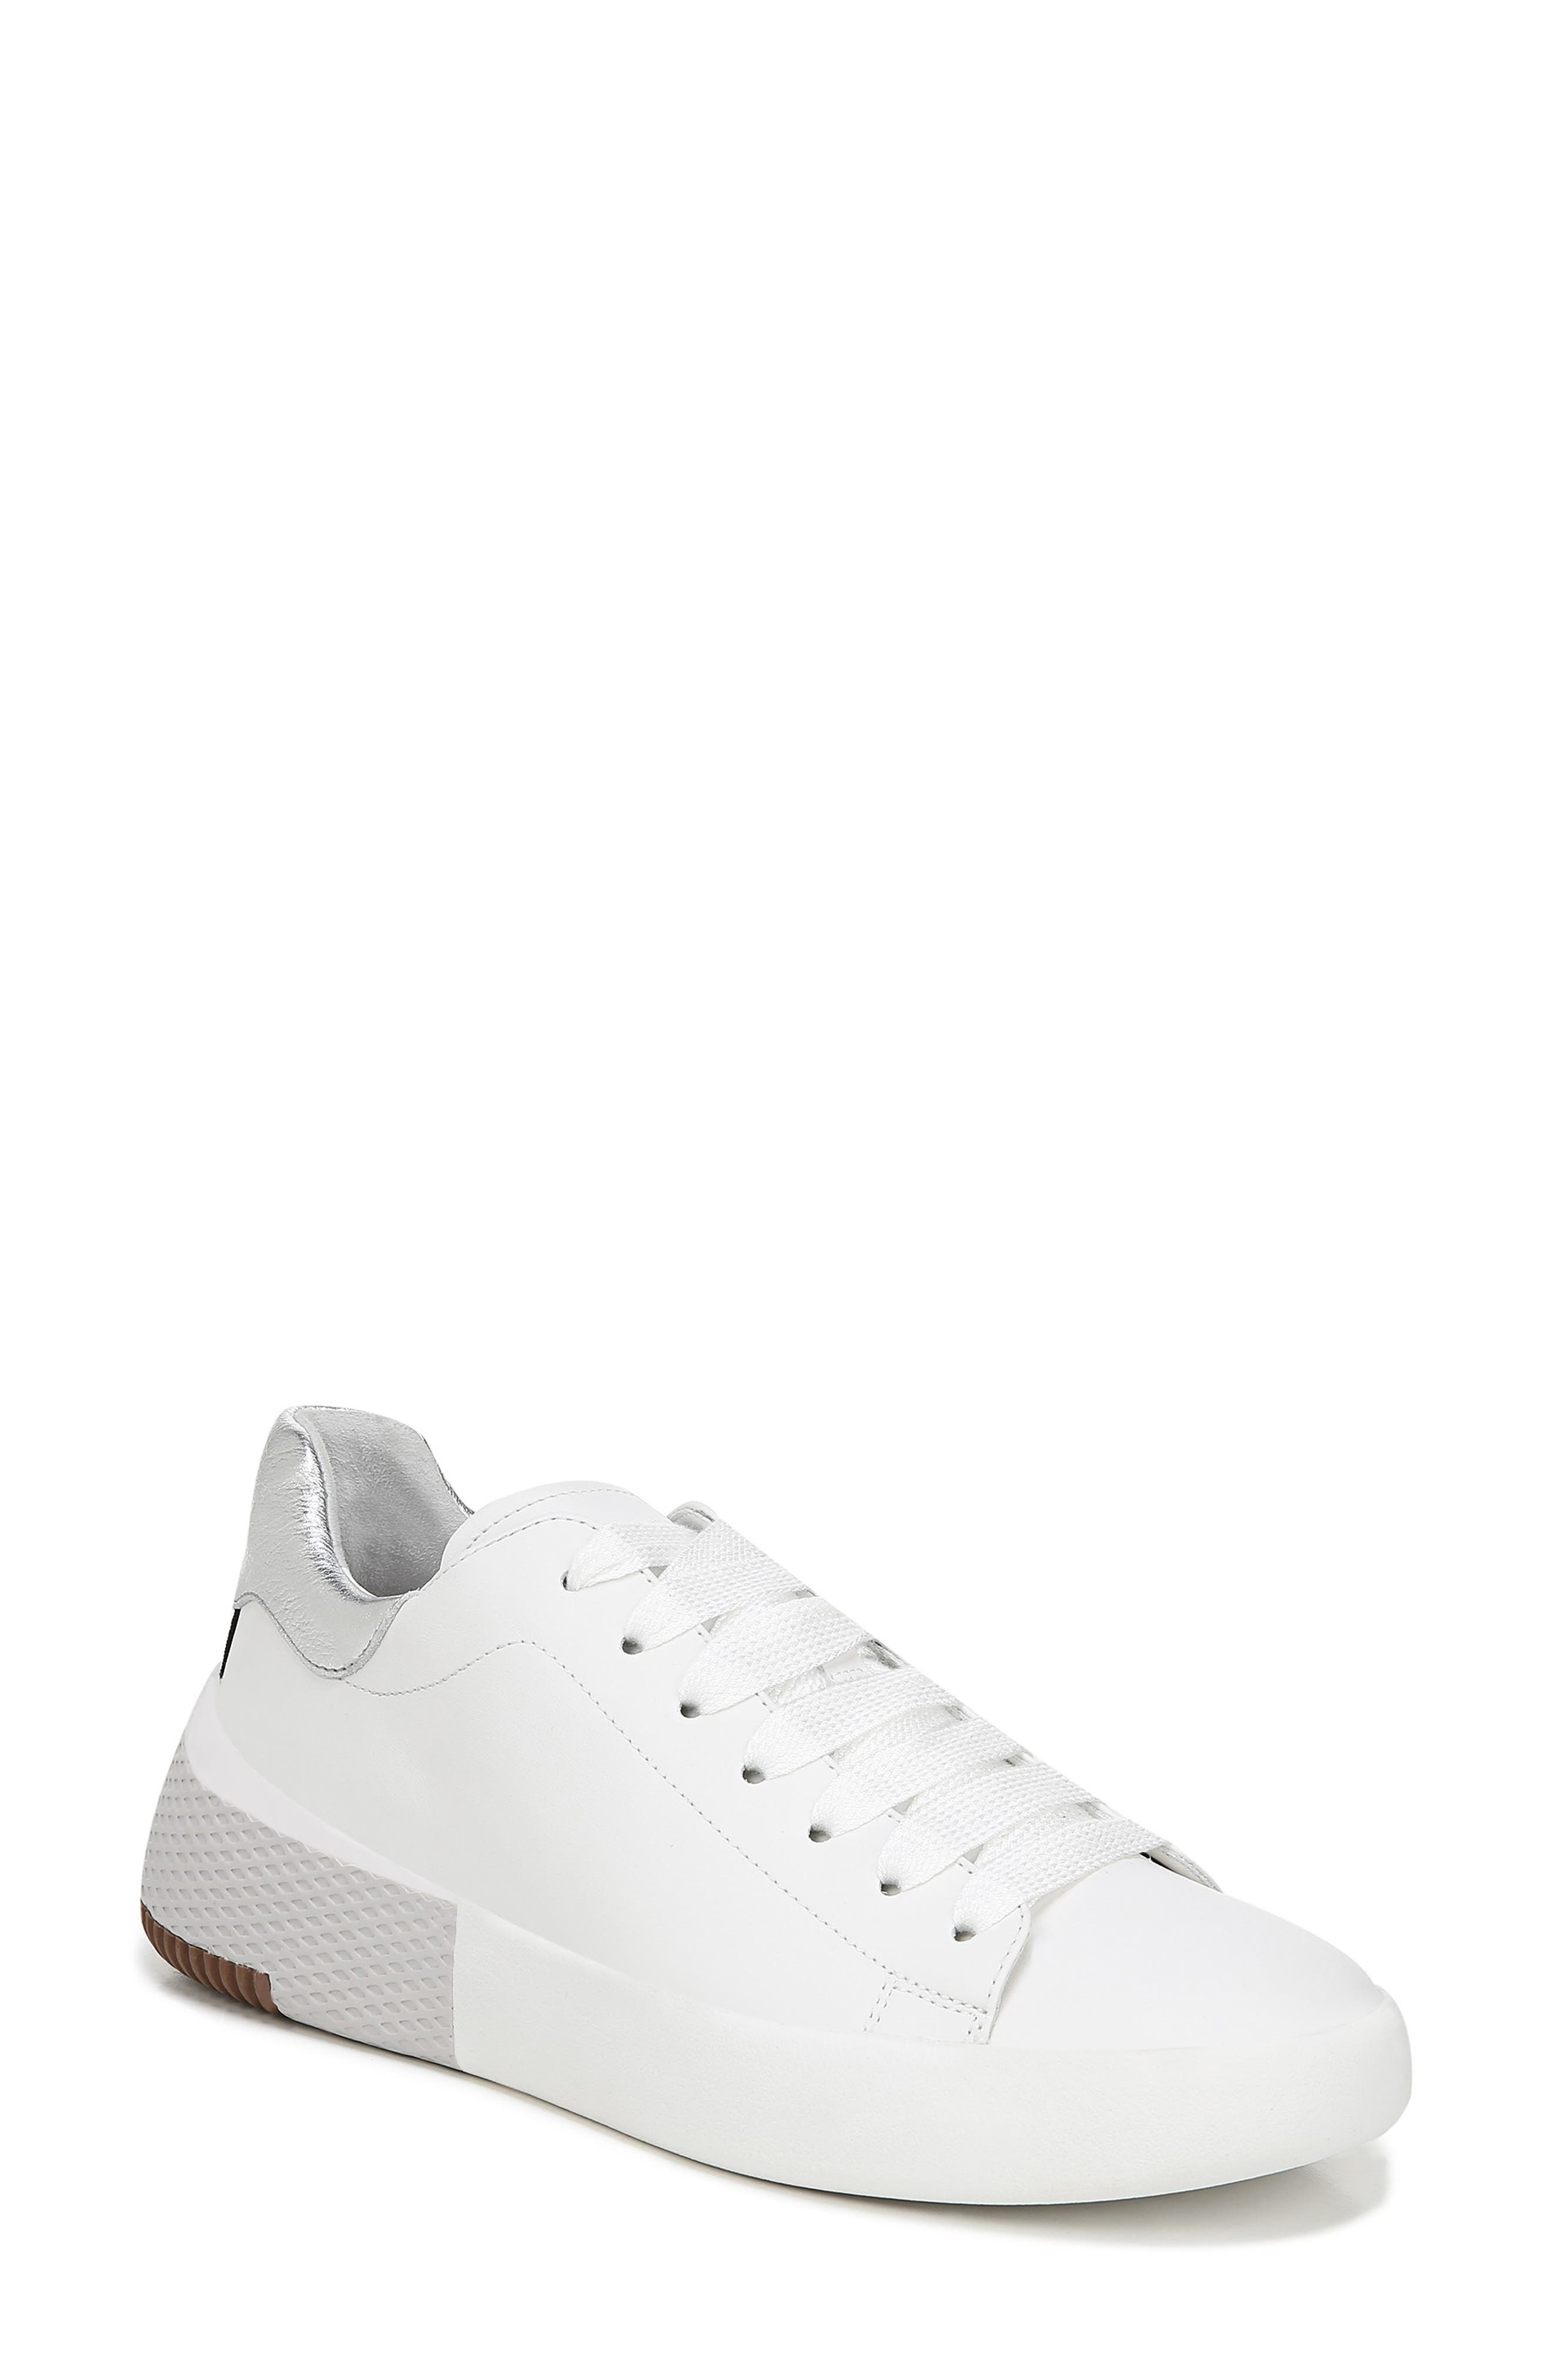 VIA SPIGA Parrel Sneaker, Main, color, PORCELAIN/ SILVER